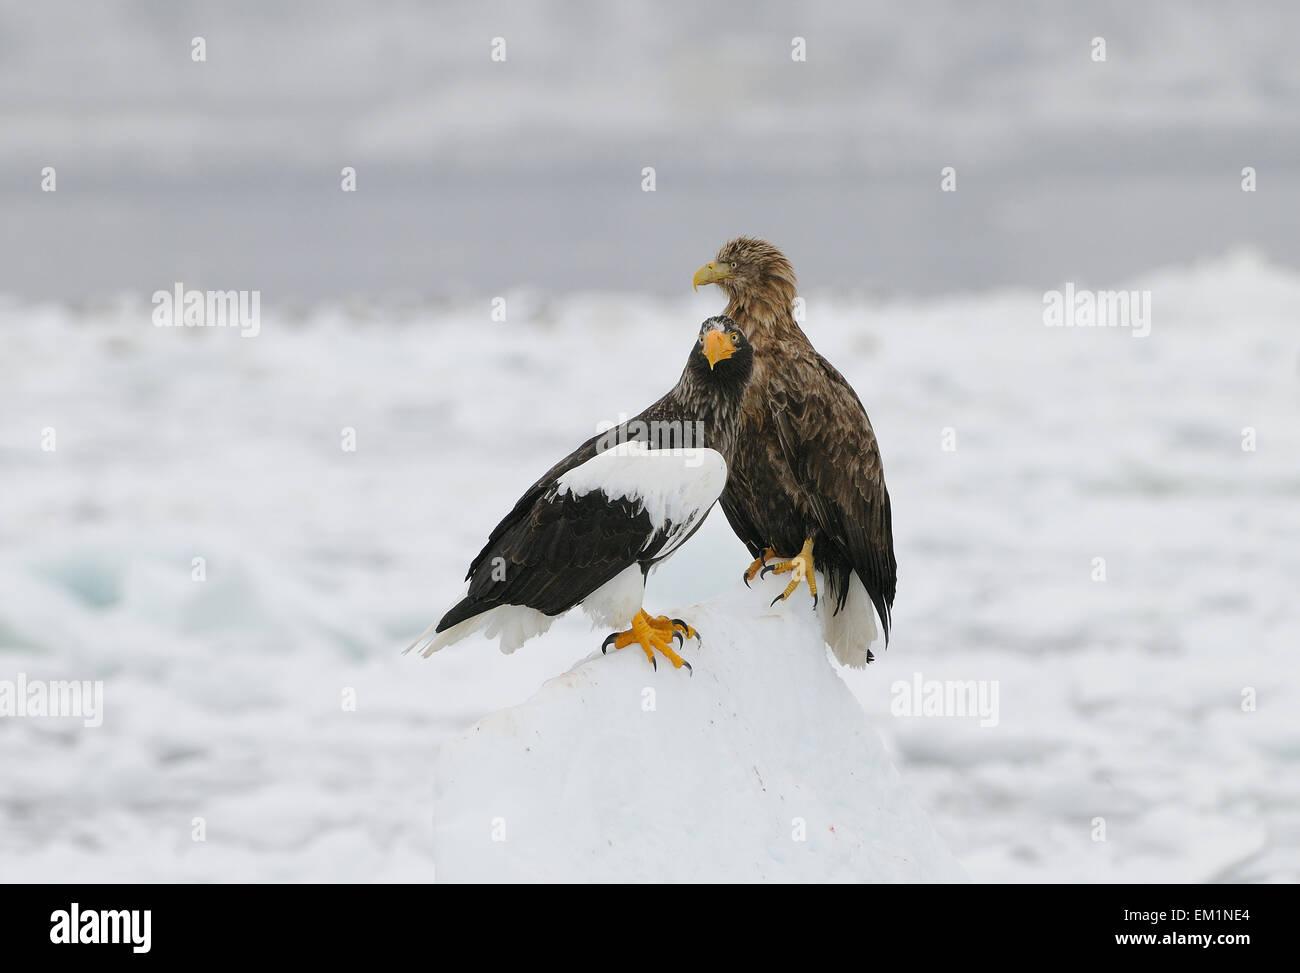 Bird Of Prey Talons 1